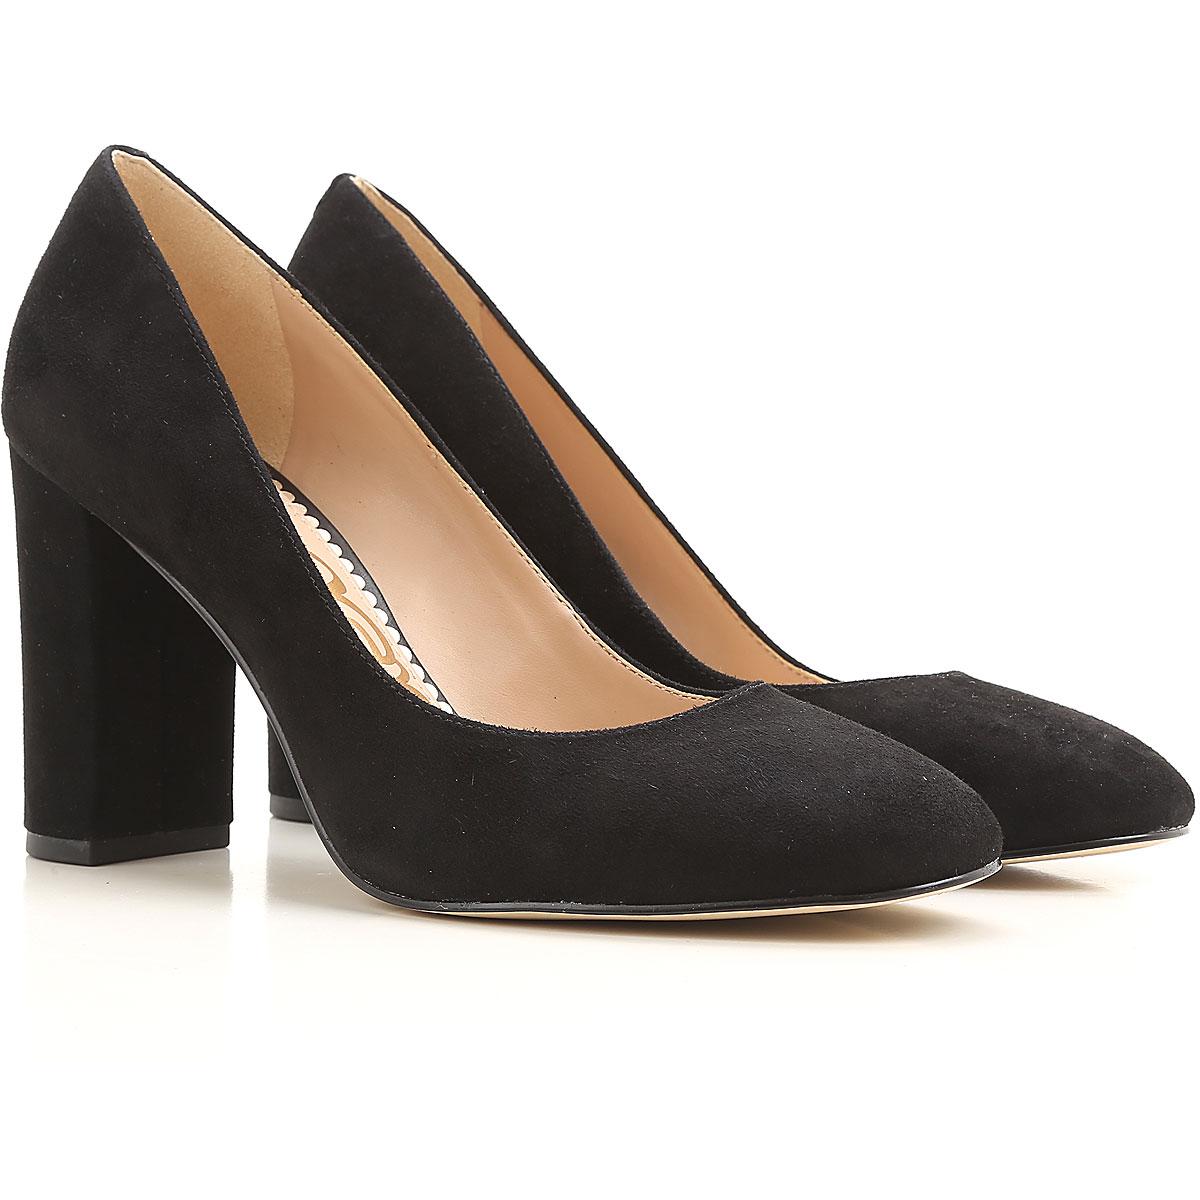 Image of Sam Edelman Pumps & High Heels for Women On Sale in Outlet, Black, suede, 2017, 10 8.5